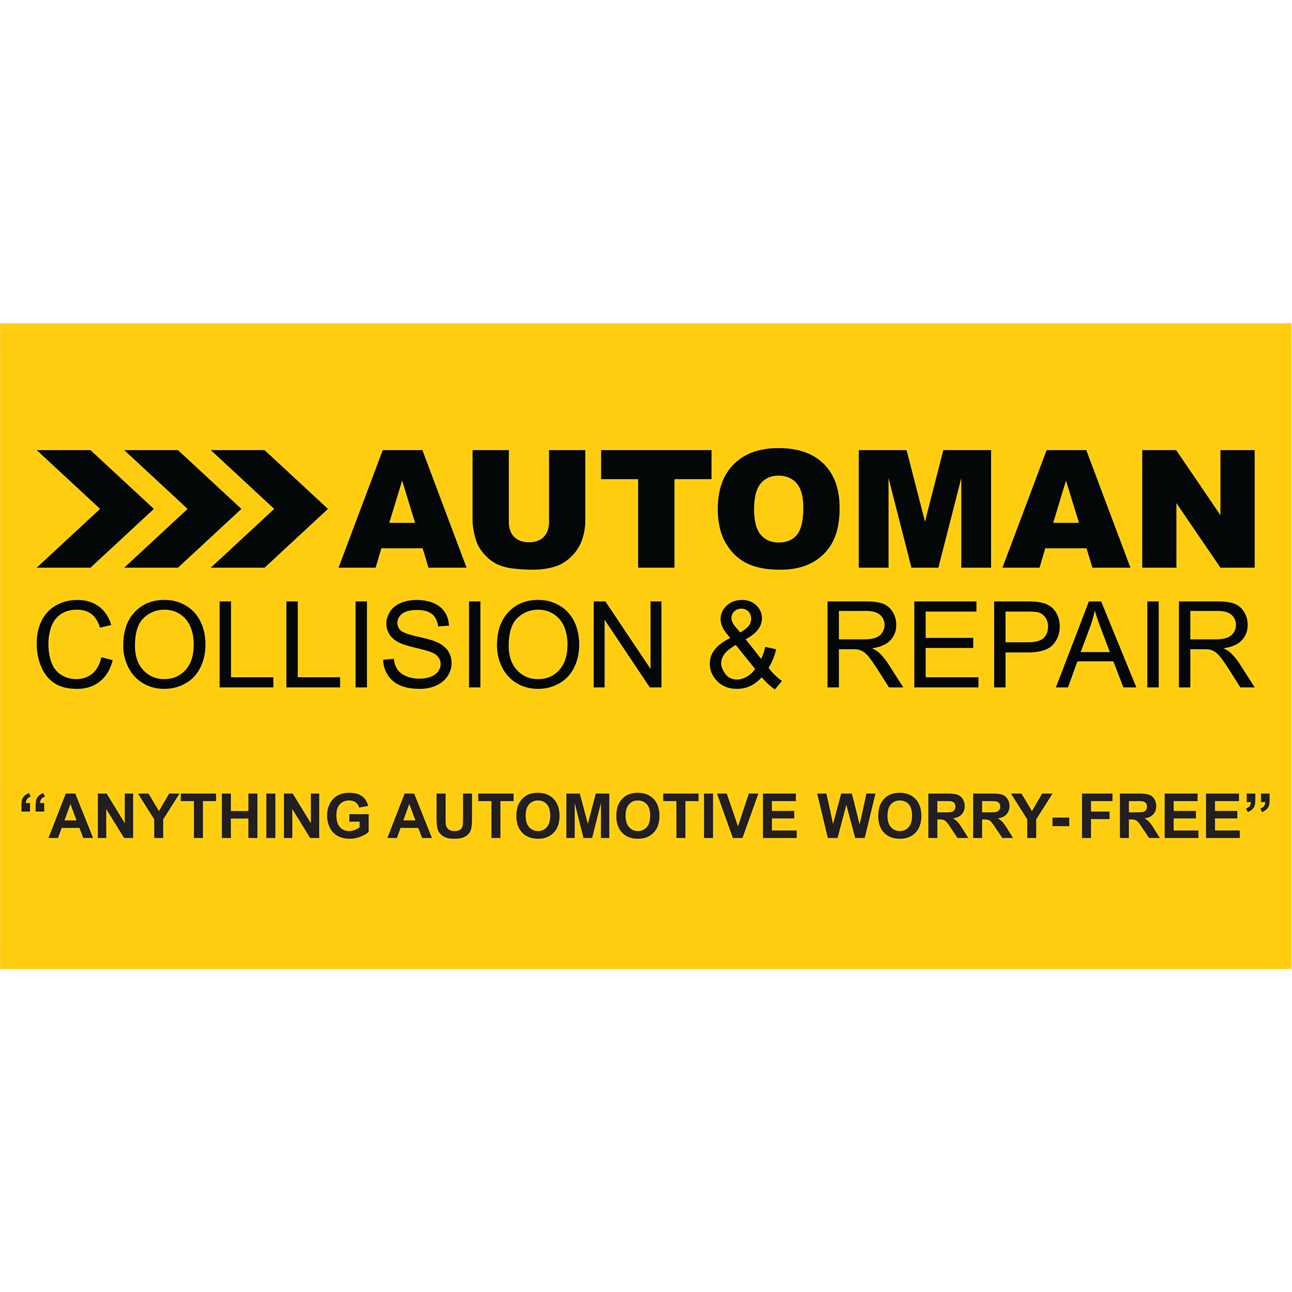 Automan Collision & Repair LLC